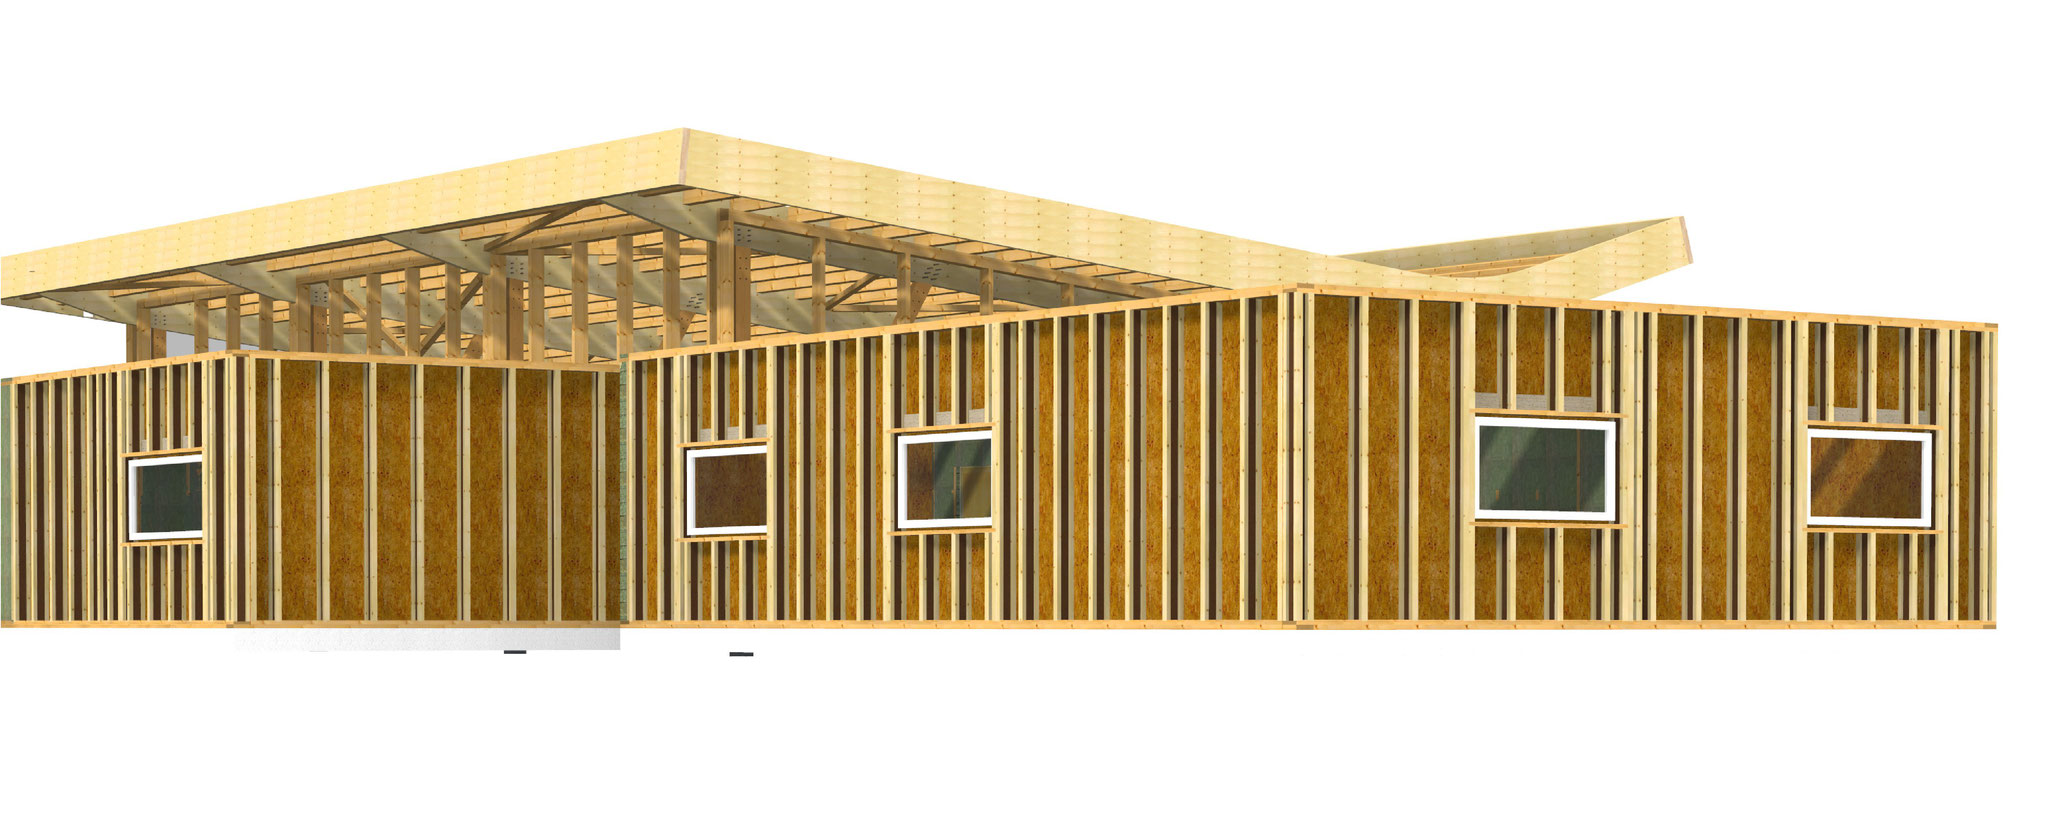 Dessin vue 3D - façade 1